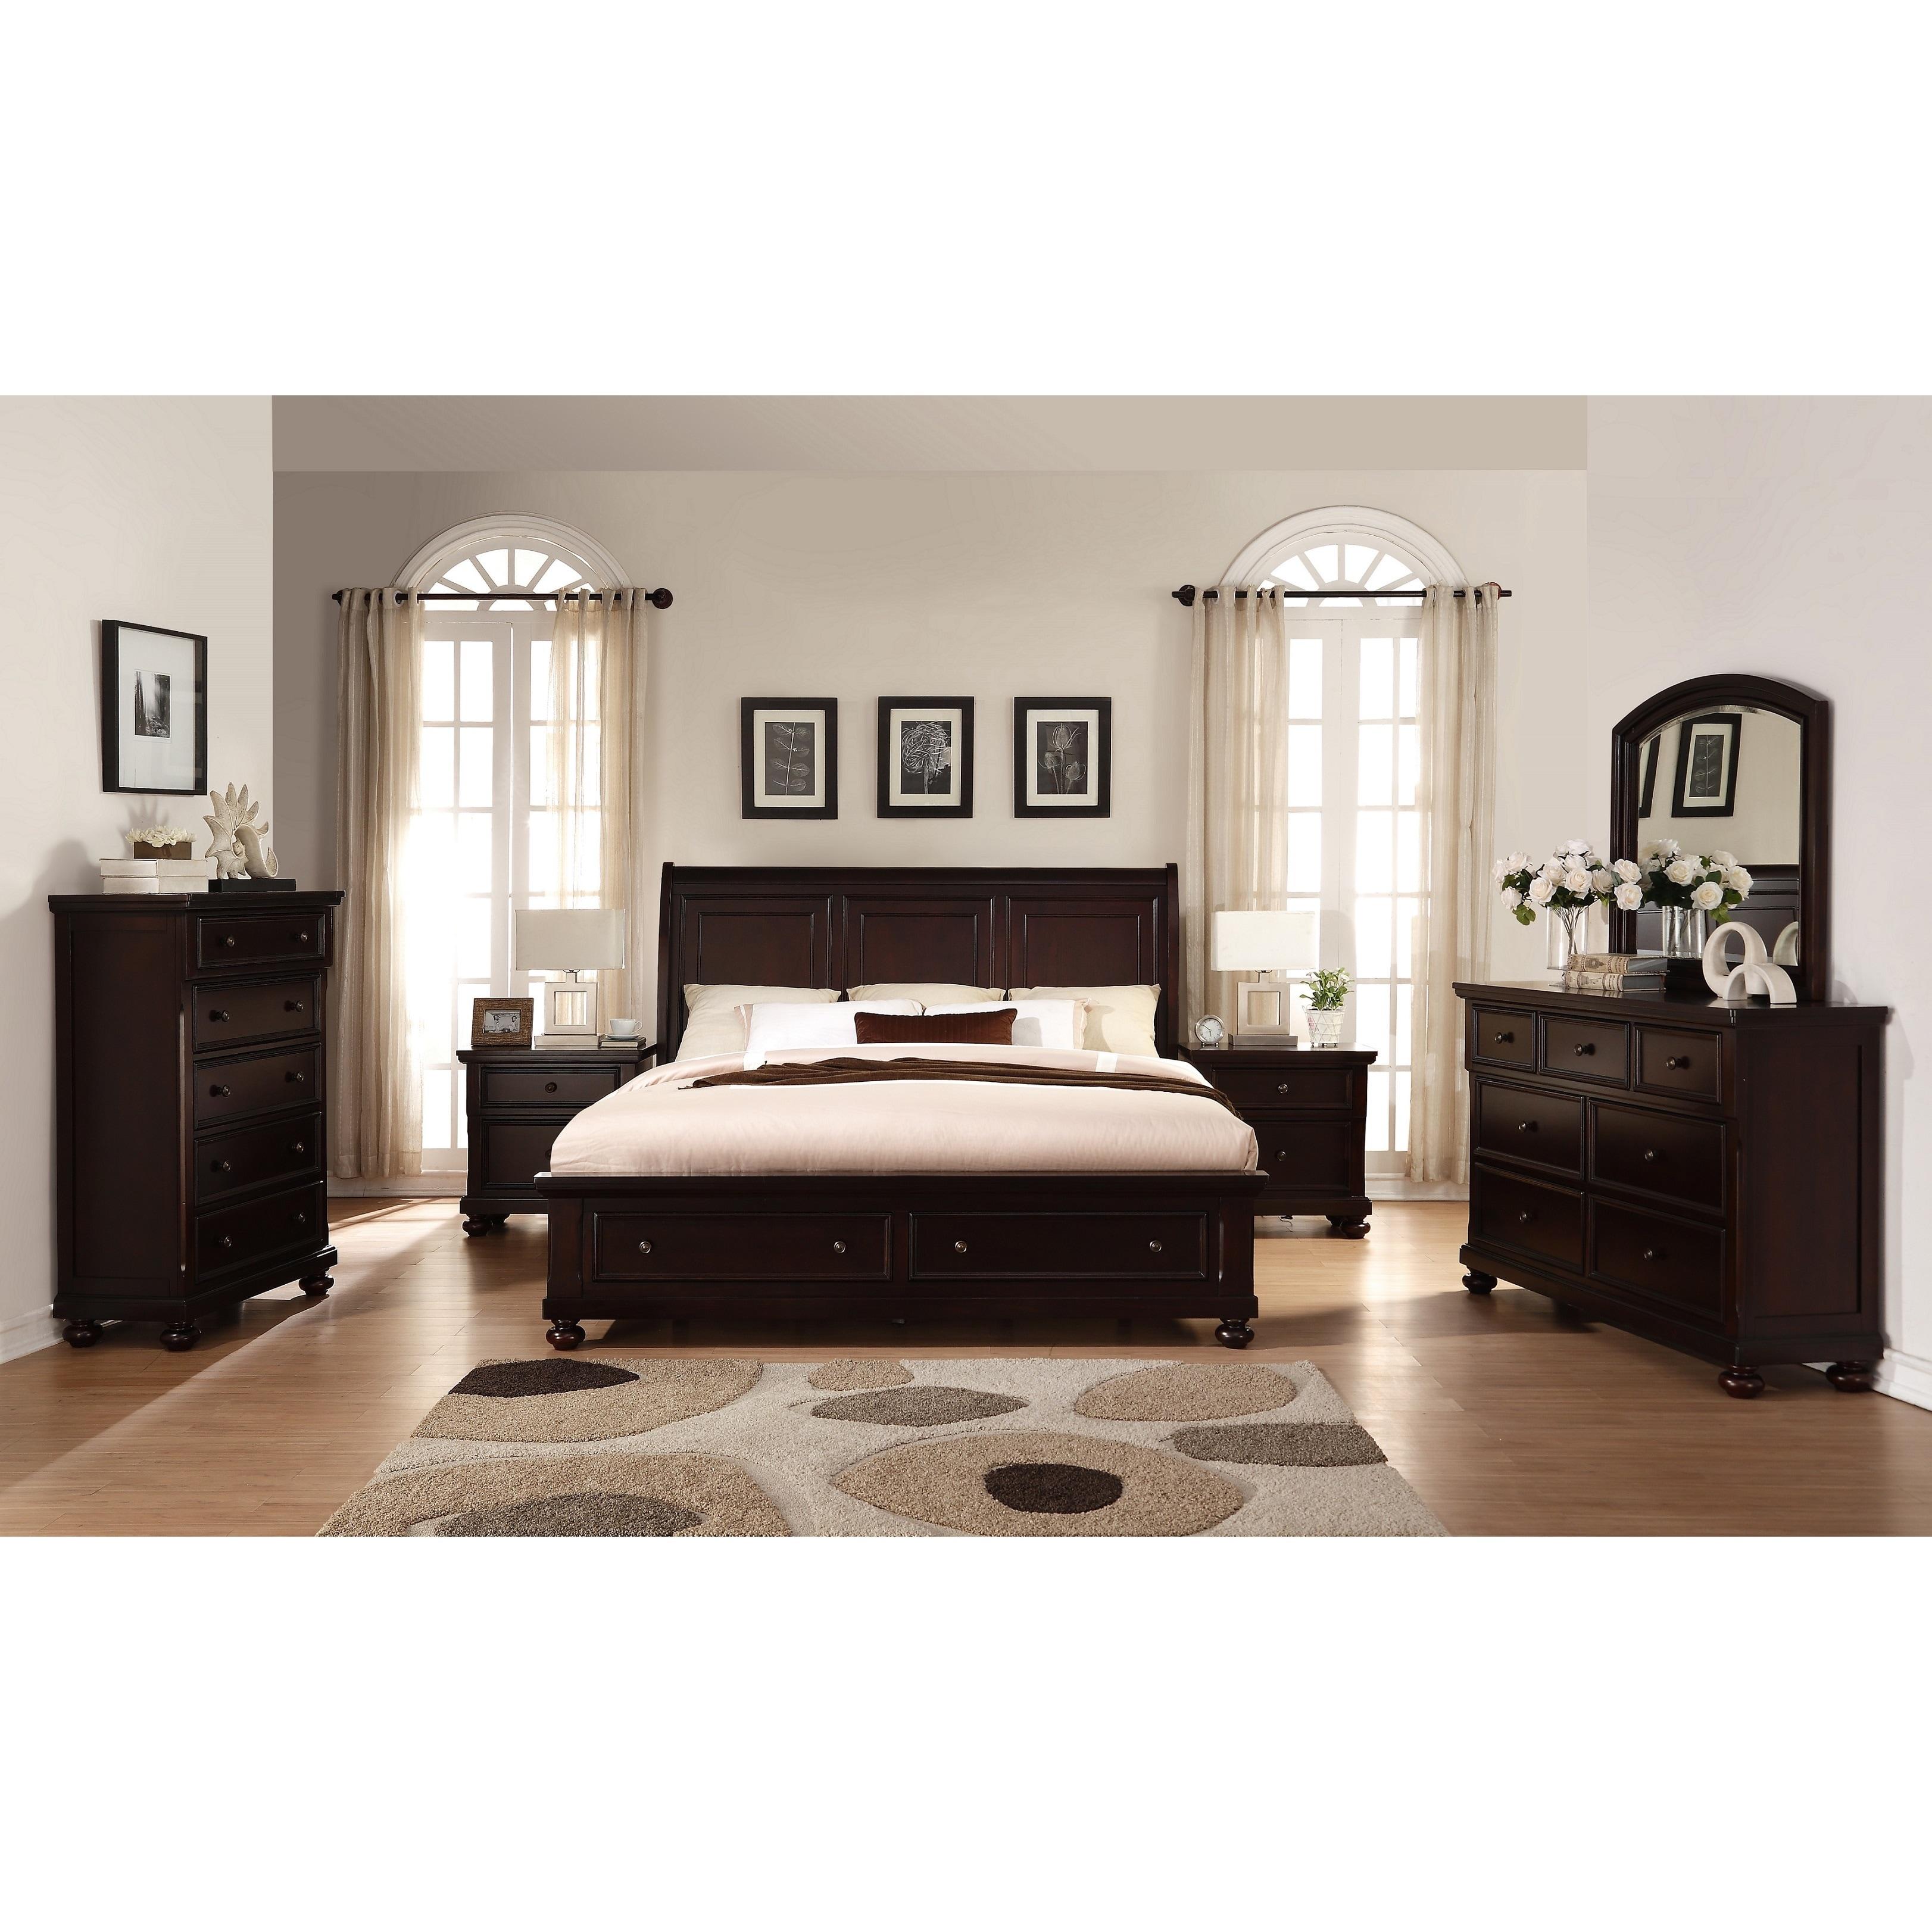 Brishland Rustic Cherry King Size Storage Bedroom Set